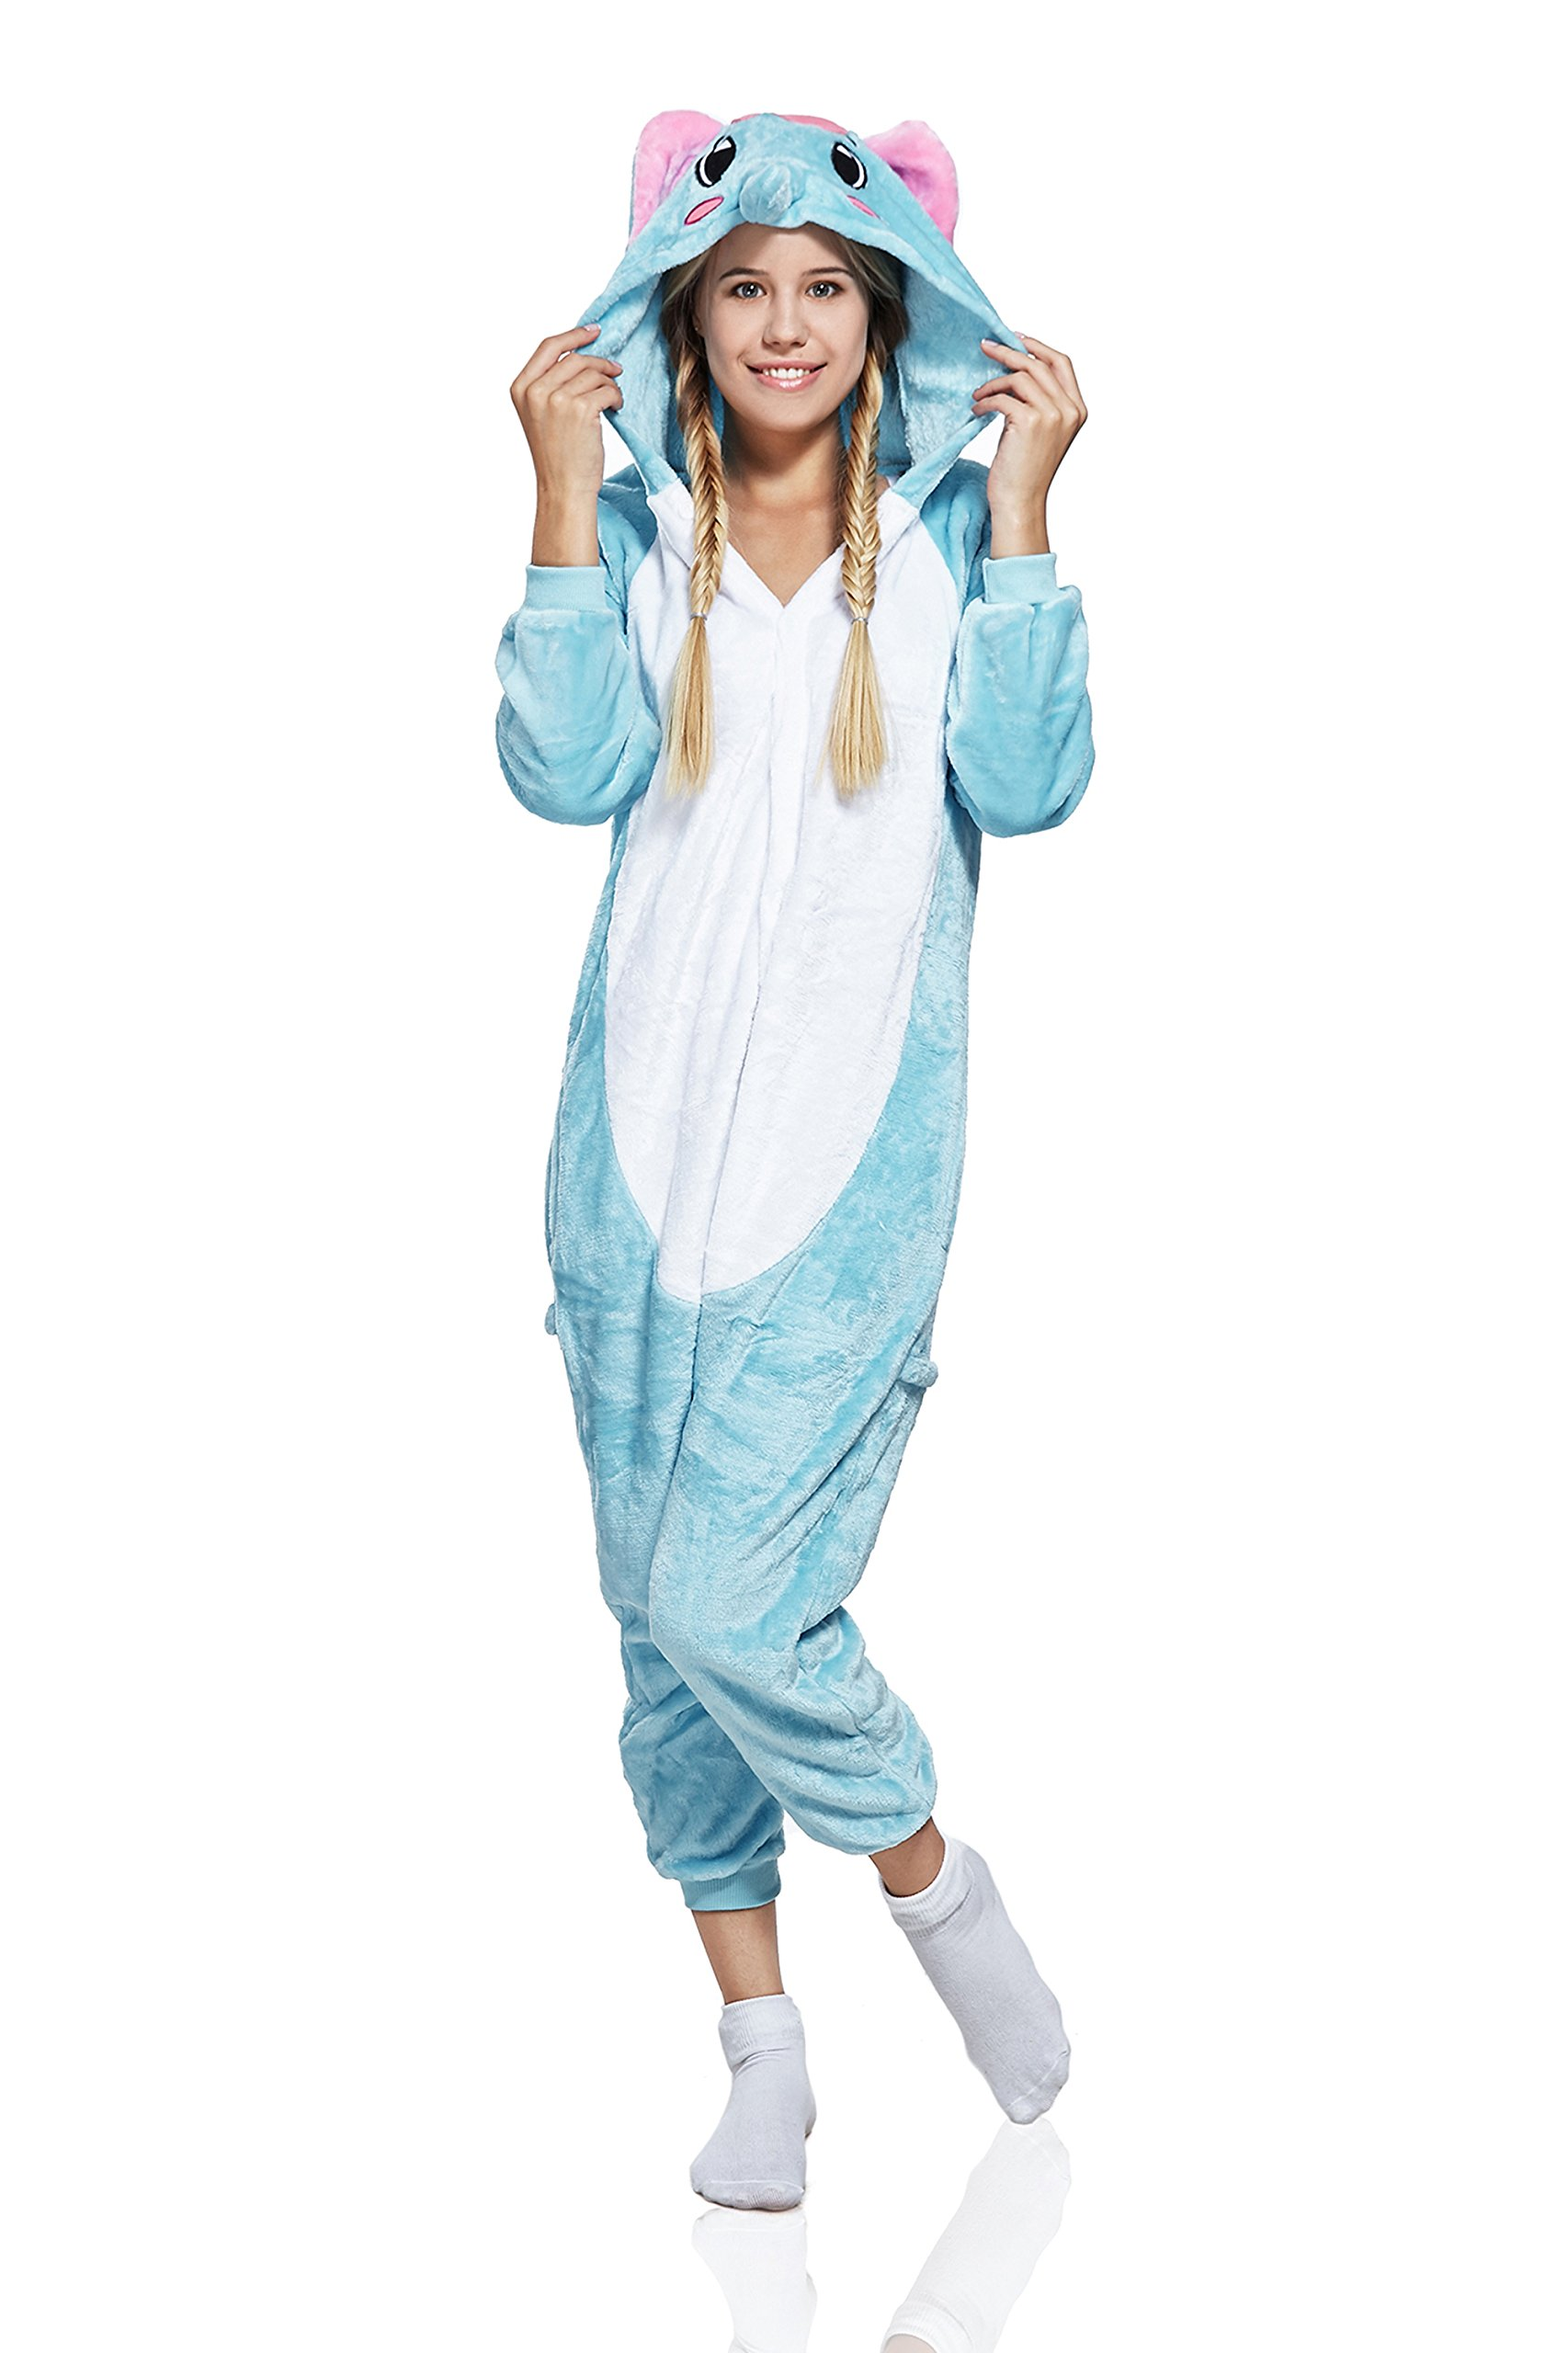 Adult Elephant Onesie Pajamas Animal Kigurumi Cosplay Costume One Piece Fleece PJS (Small, Light Blue/White)